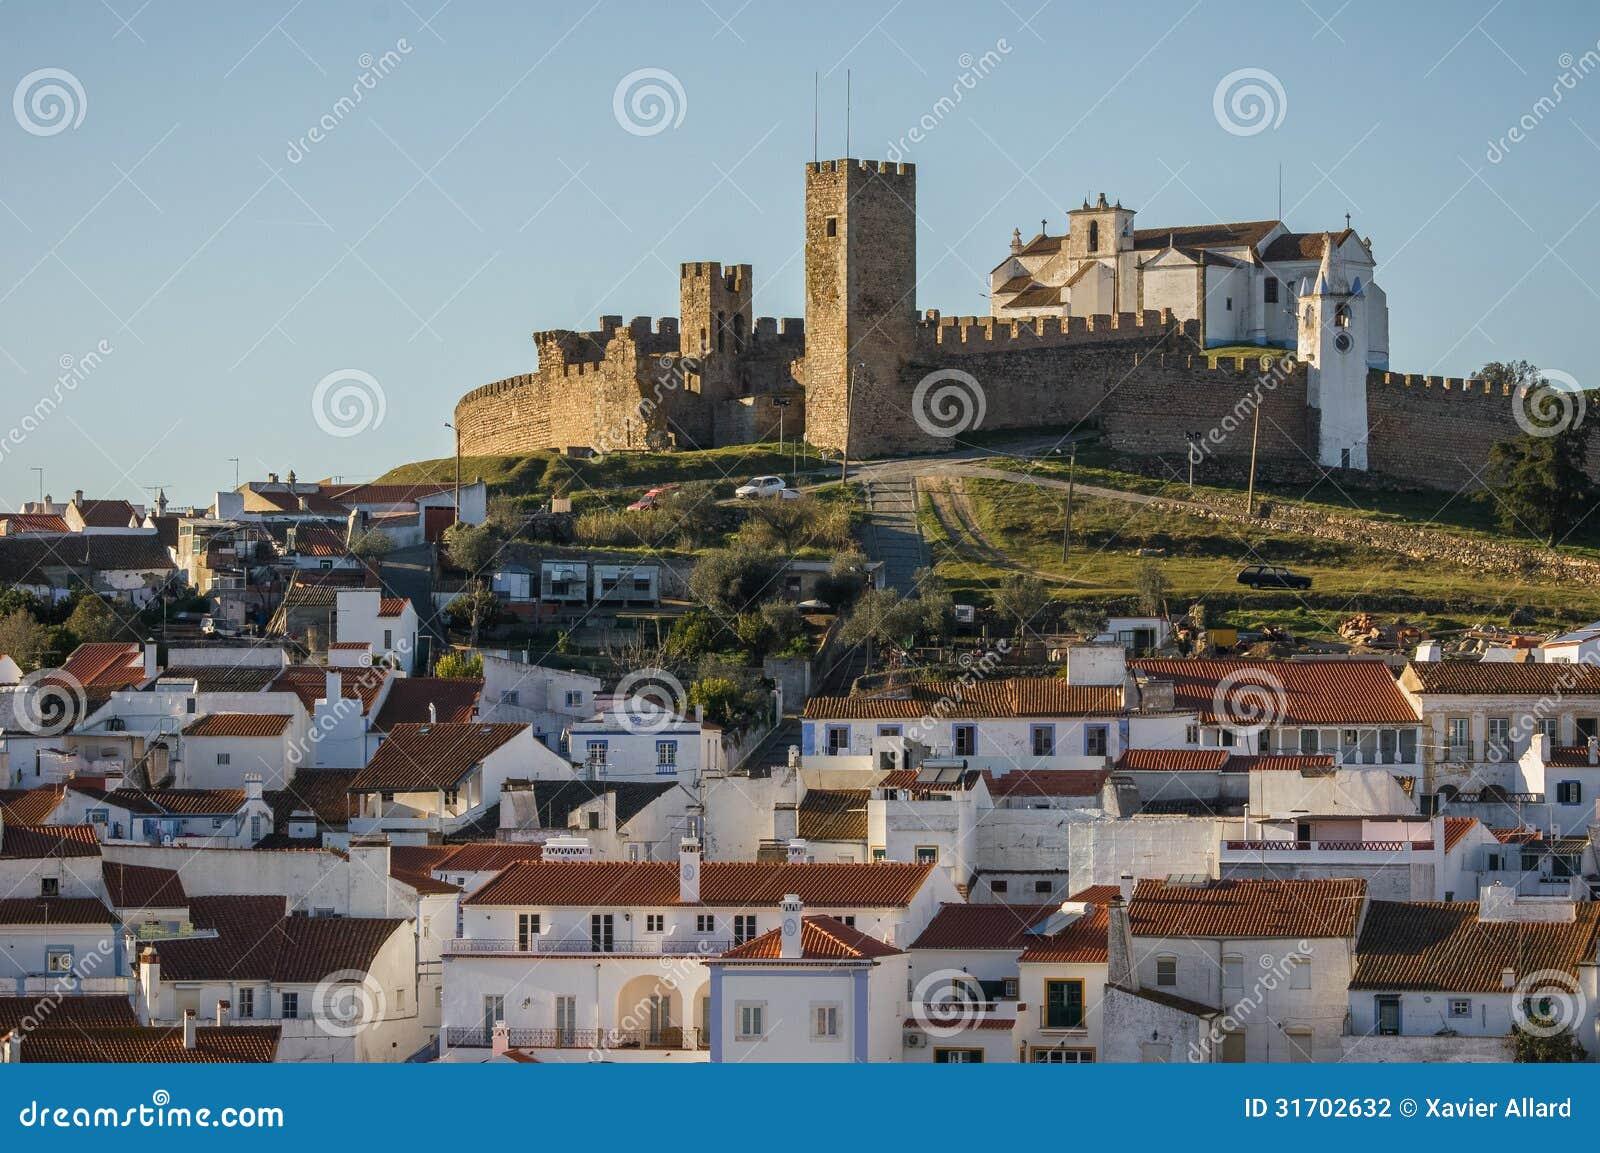 Arraiolos Portugal  city photos : Arraiolos, Portugal Stock Photography Image: 31702632